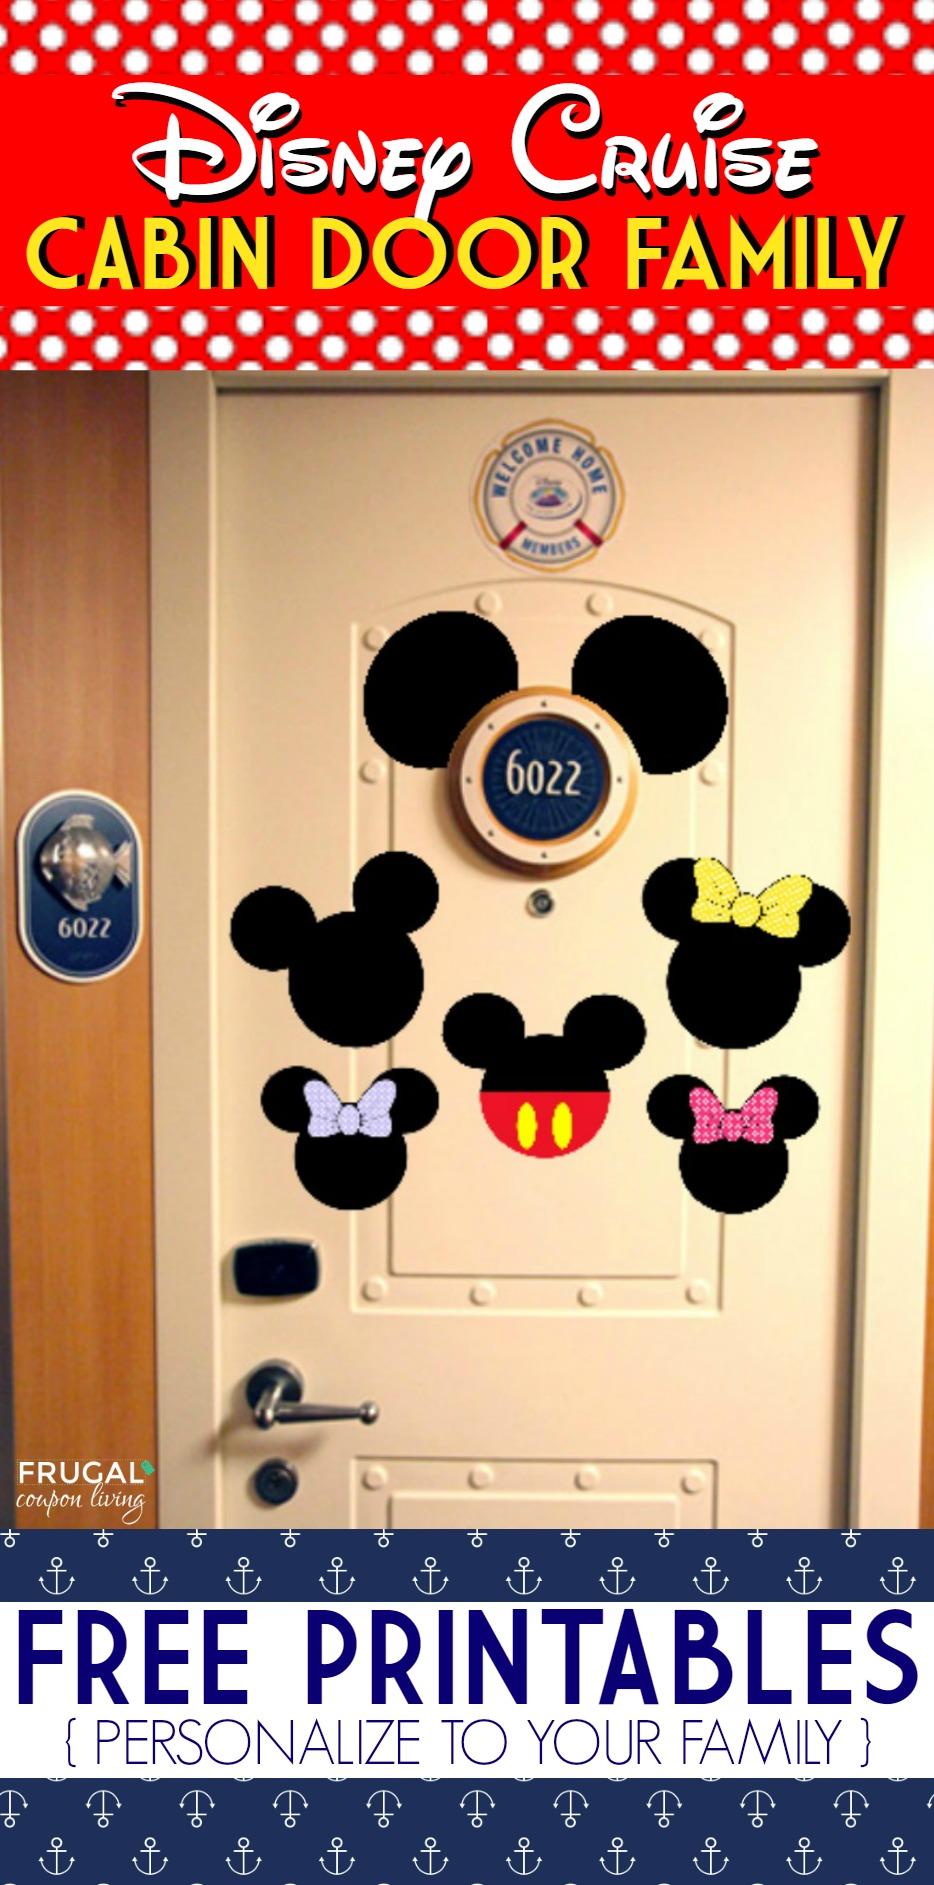 Disney-Cruise-Door-Printable-Title-Frugal-coupon-Living